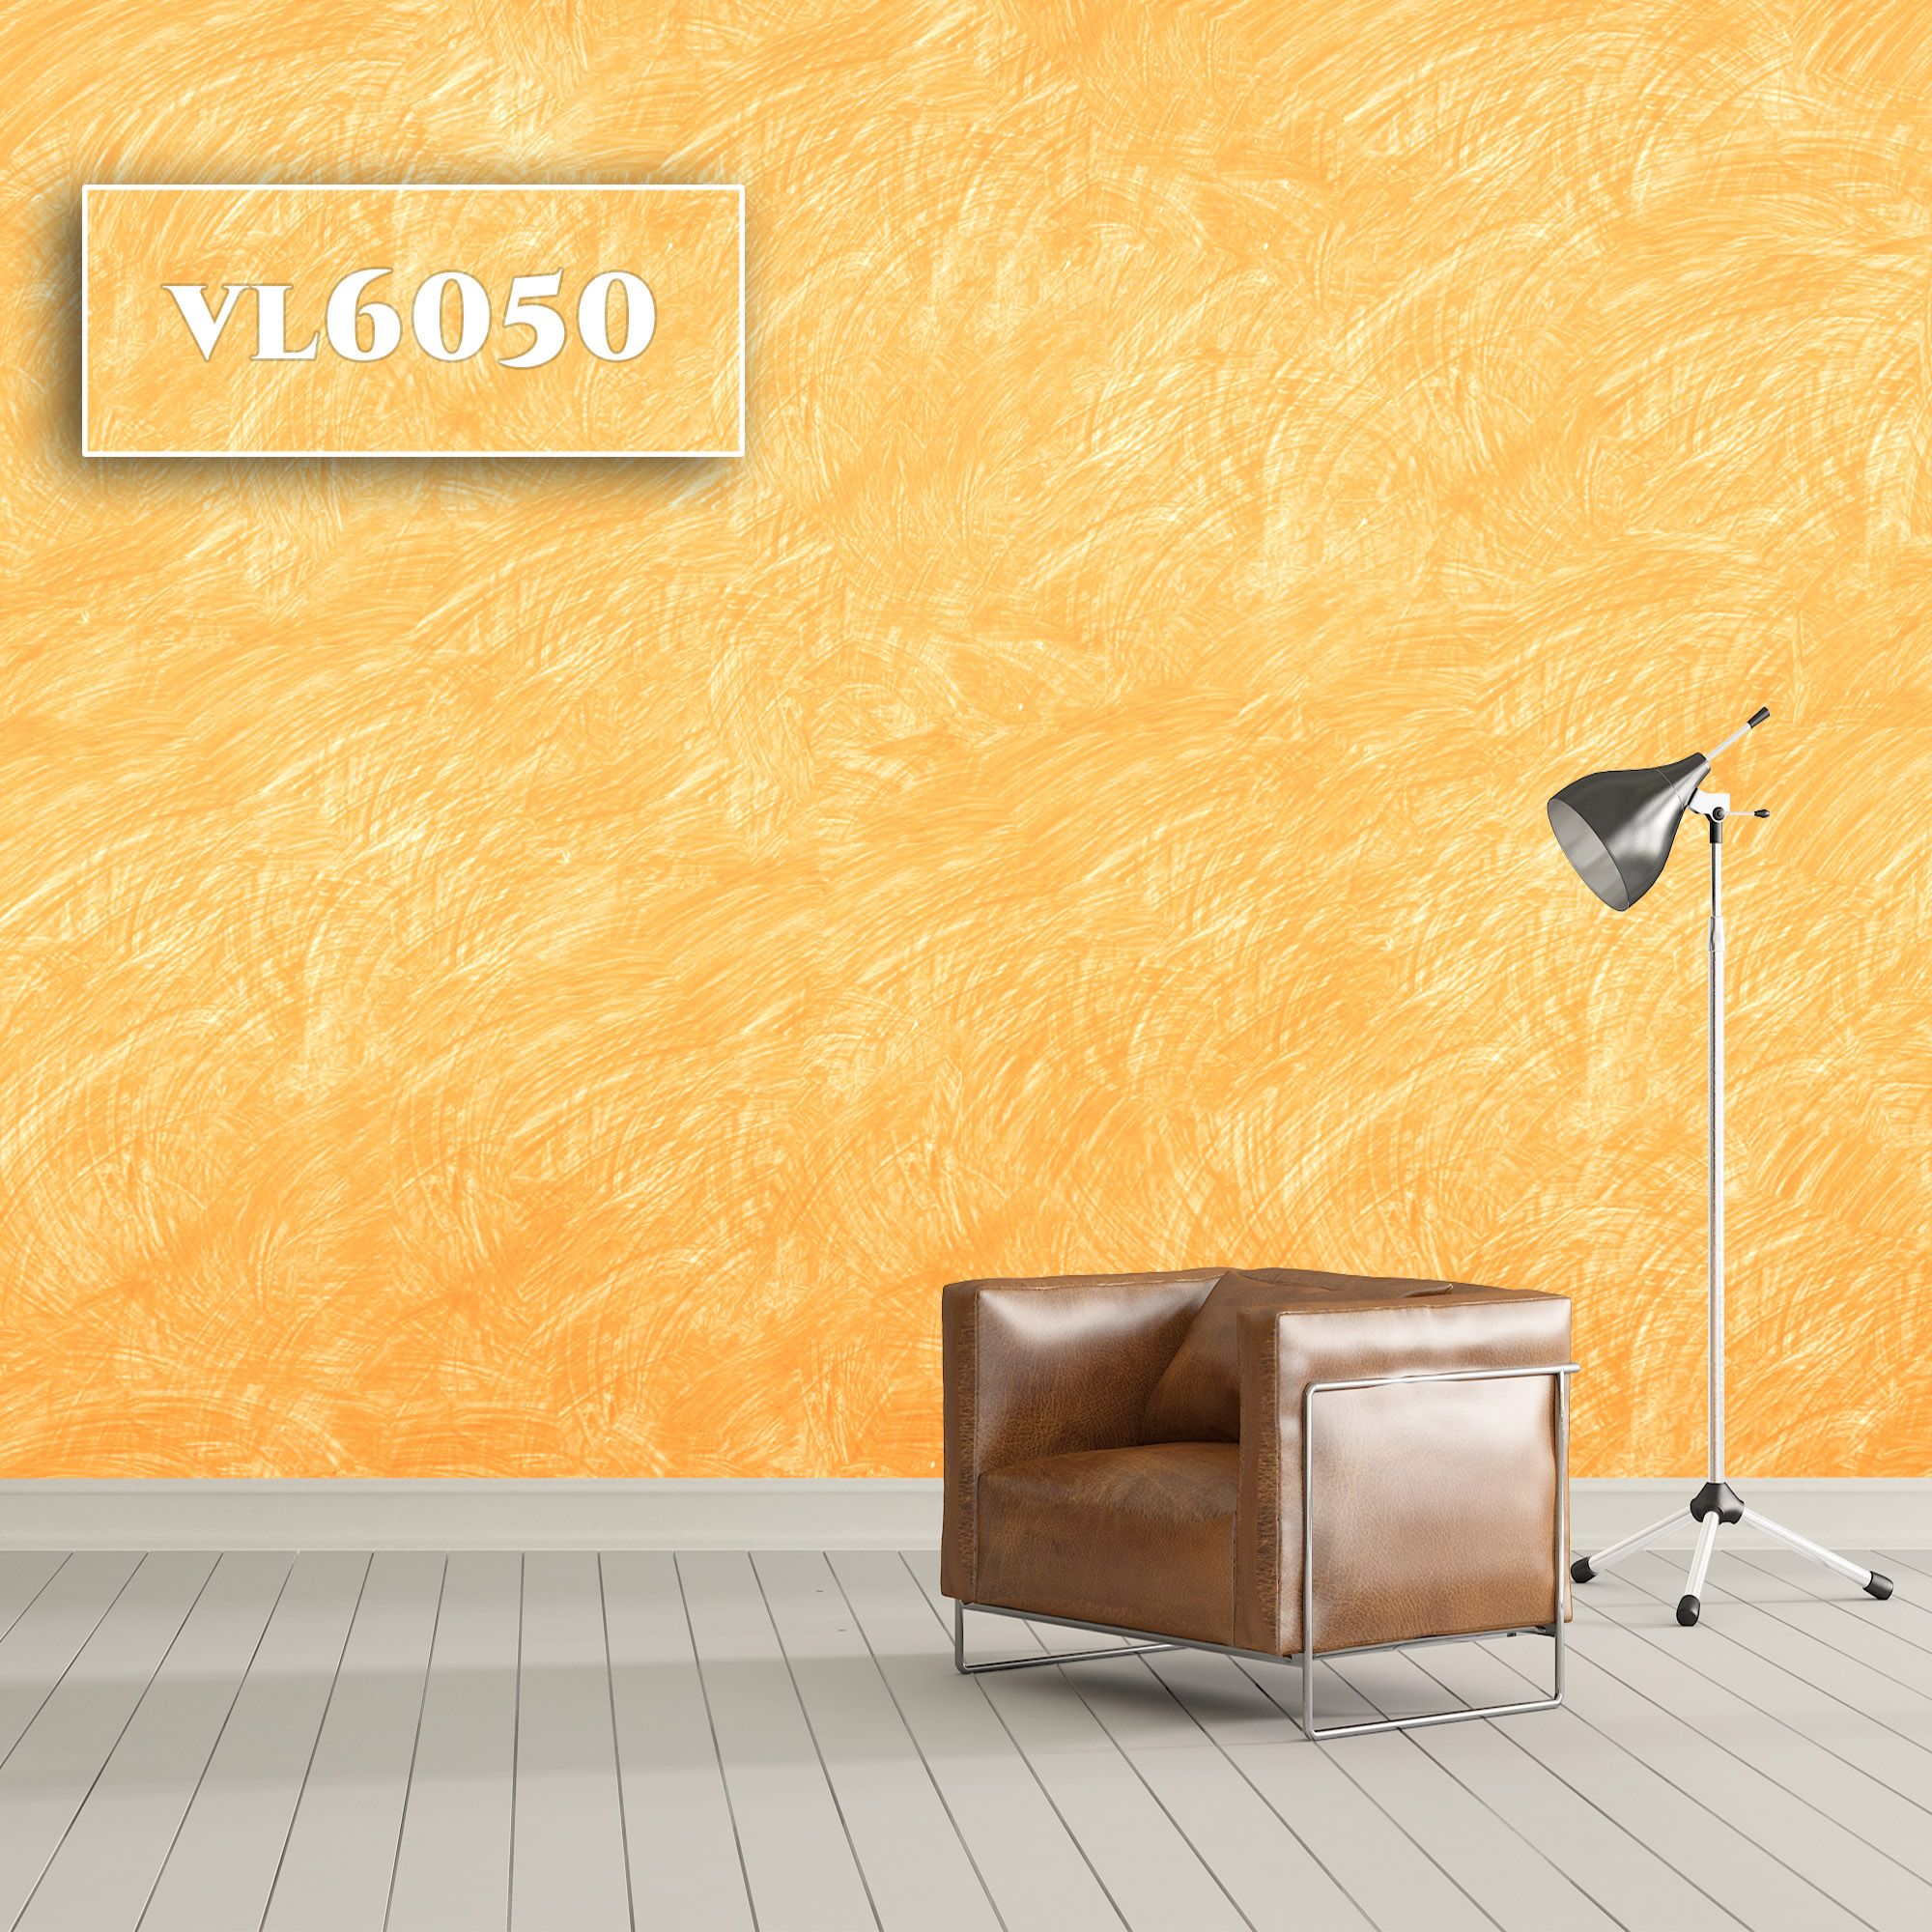 VL6050